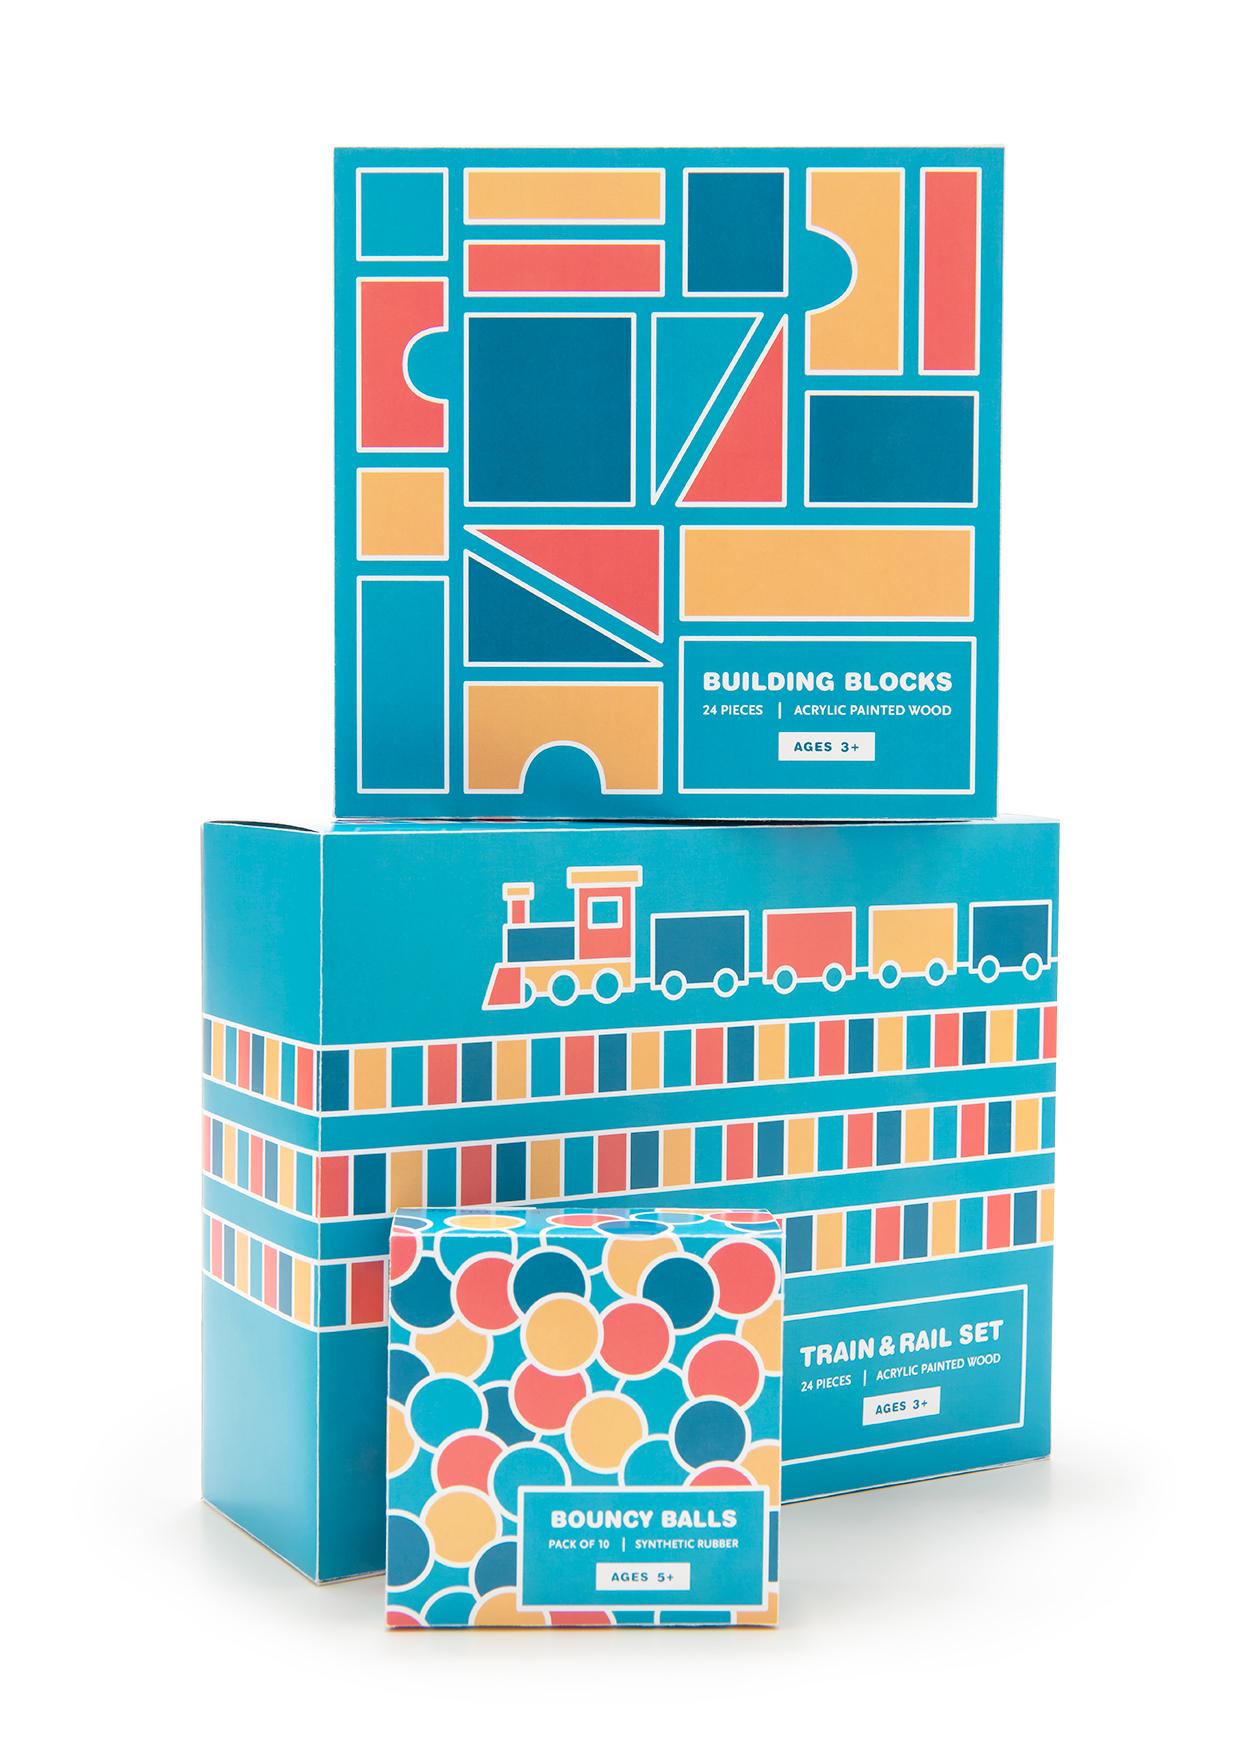 Nannigans_Packaging